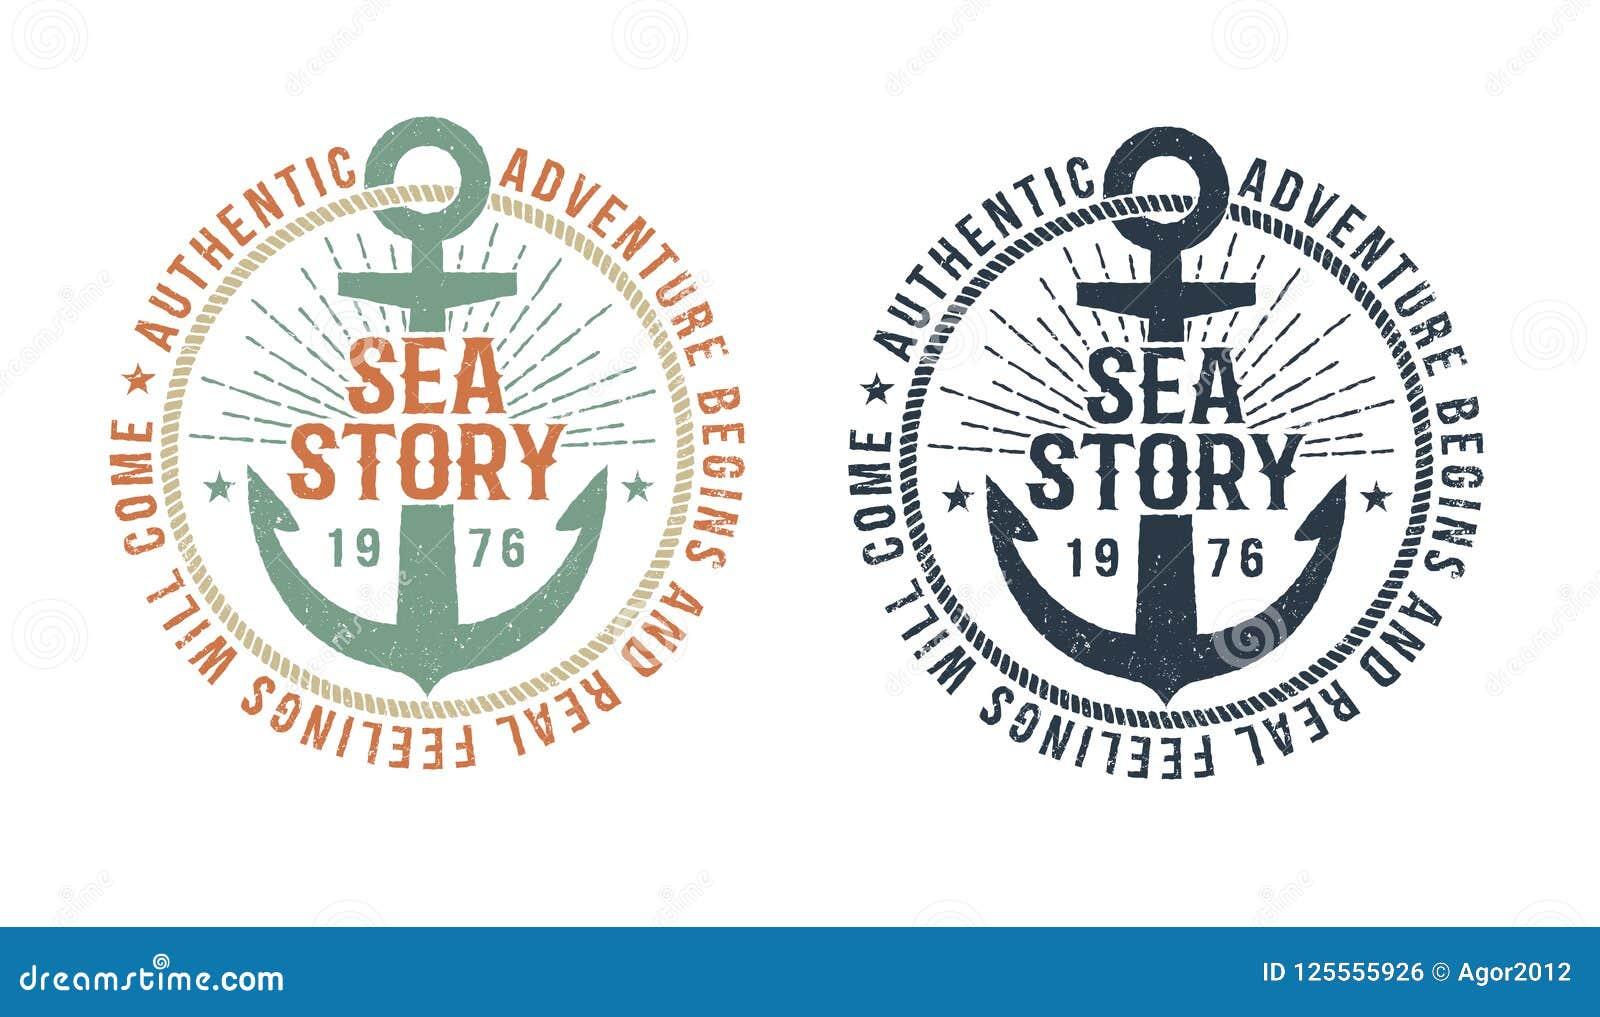 Vintage marine logo, tattoo with anchor